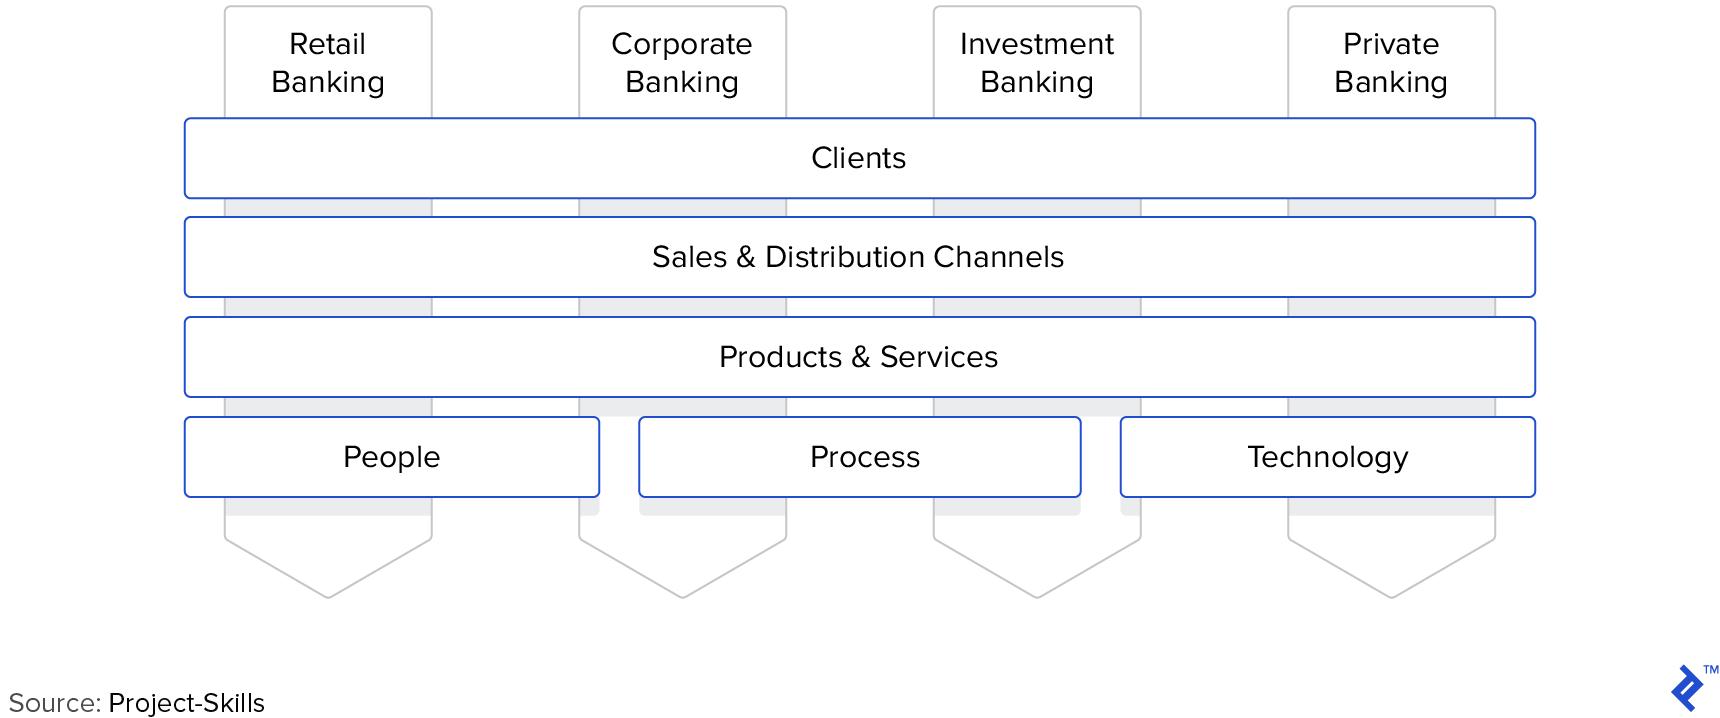 Silo approach toward organizational management in banking.